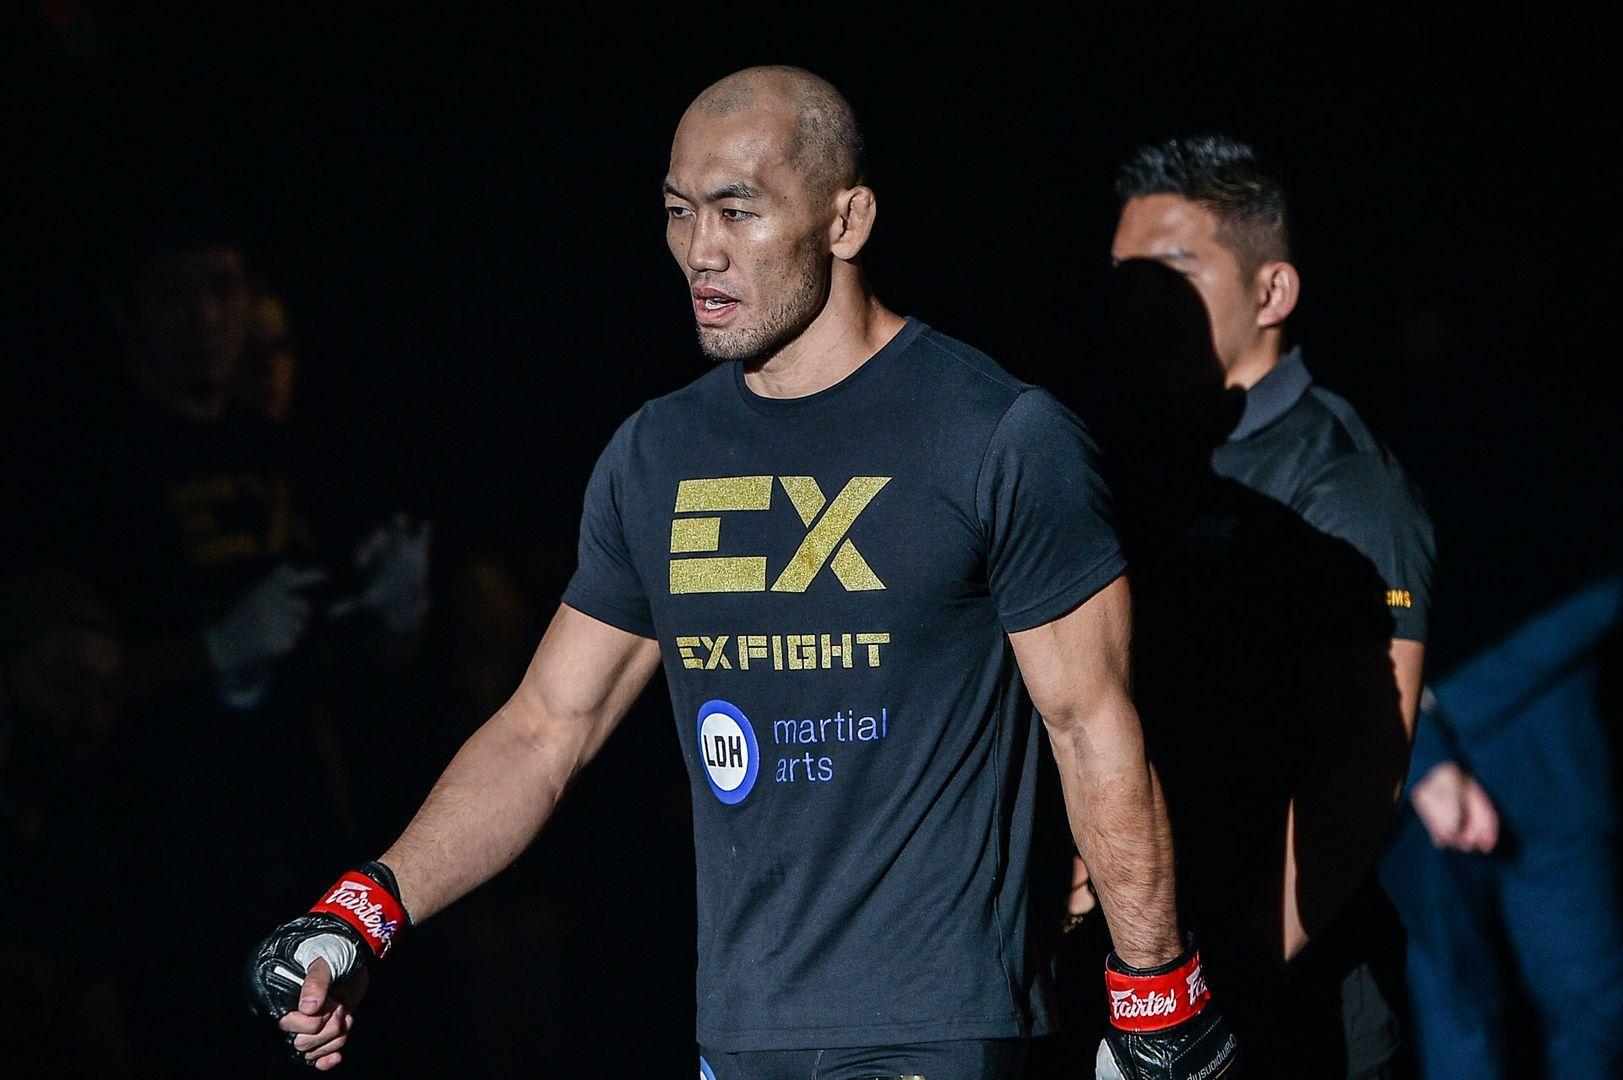 Japanese mixed martial arts legend Yushin Okami enters the arena